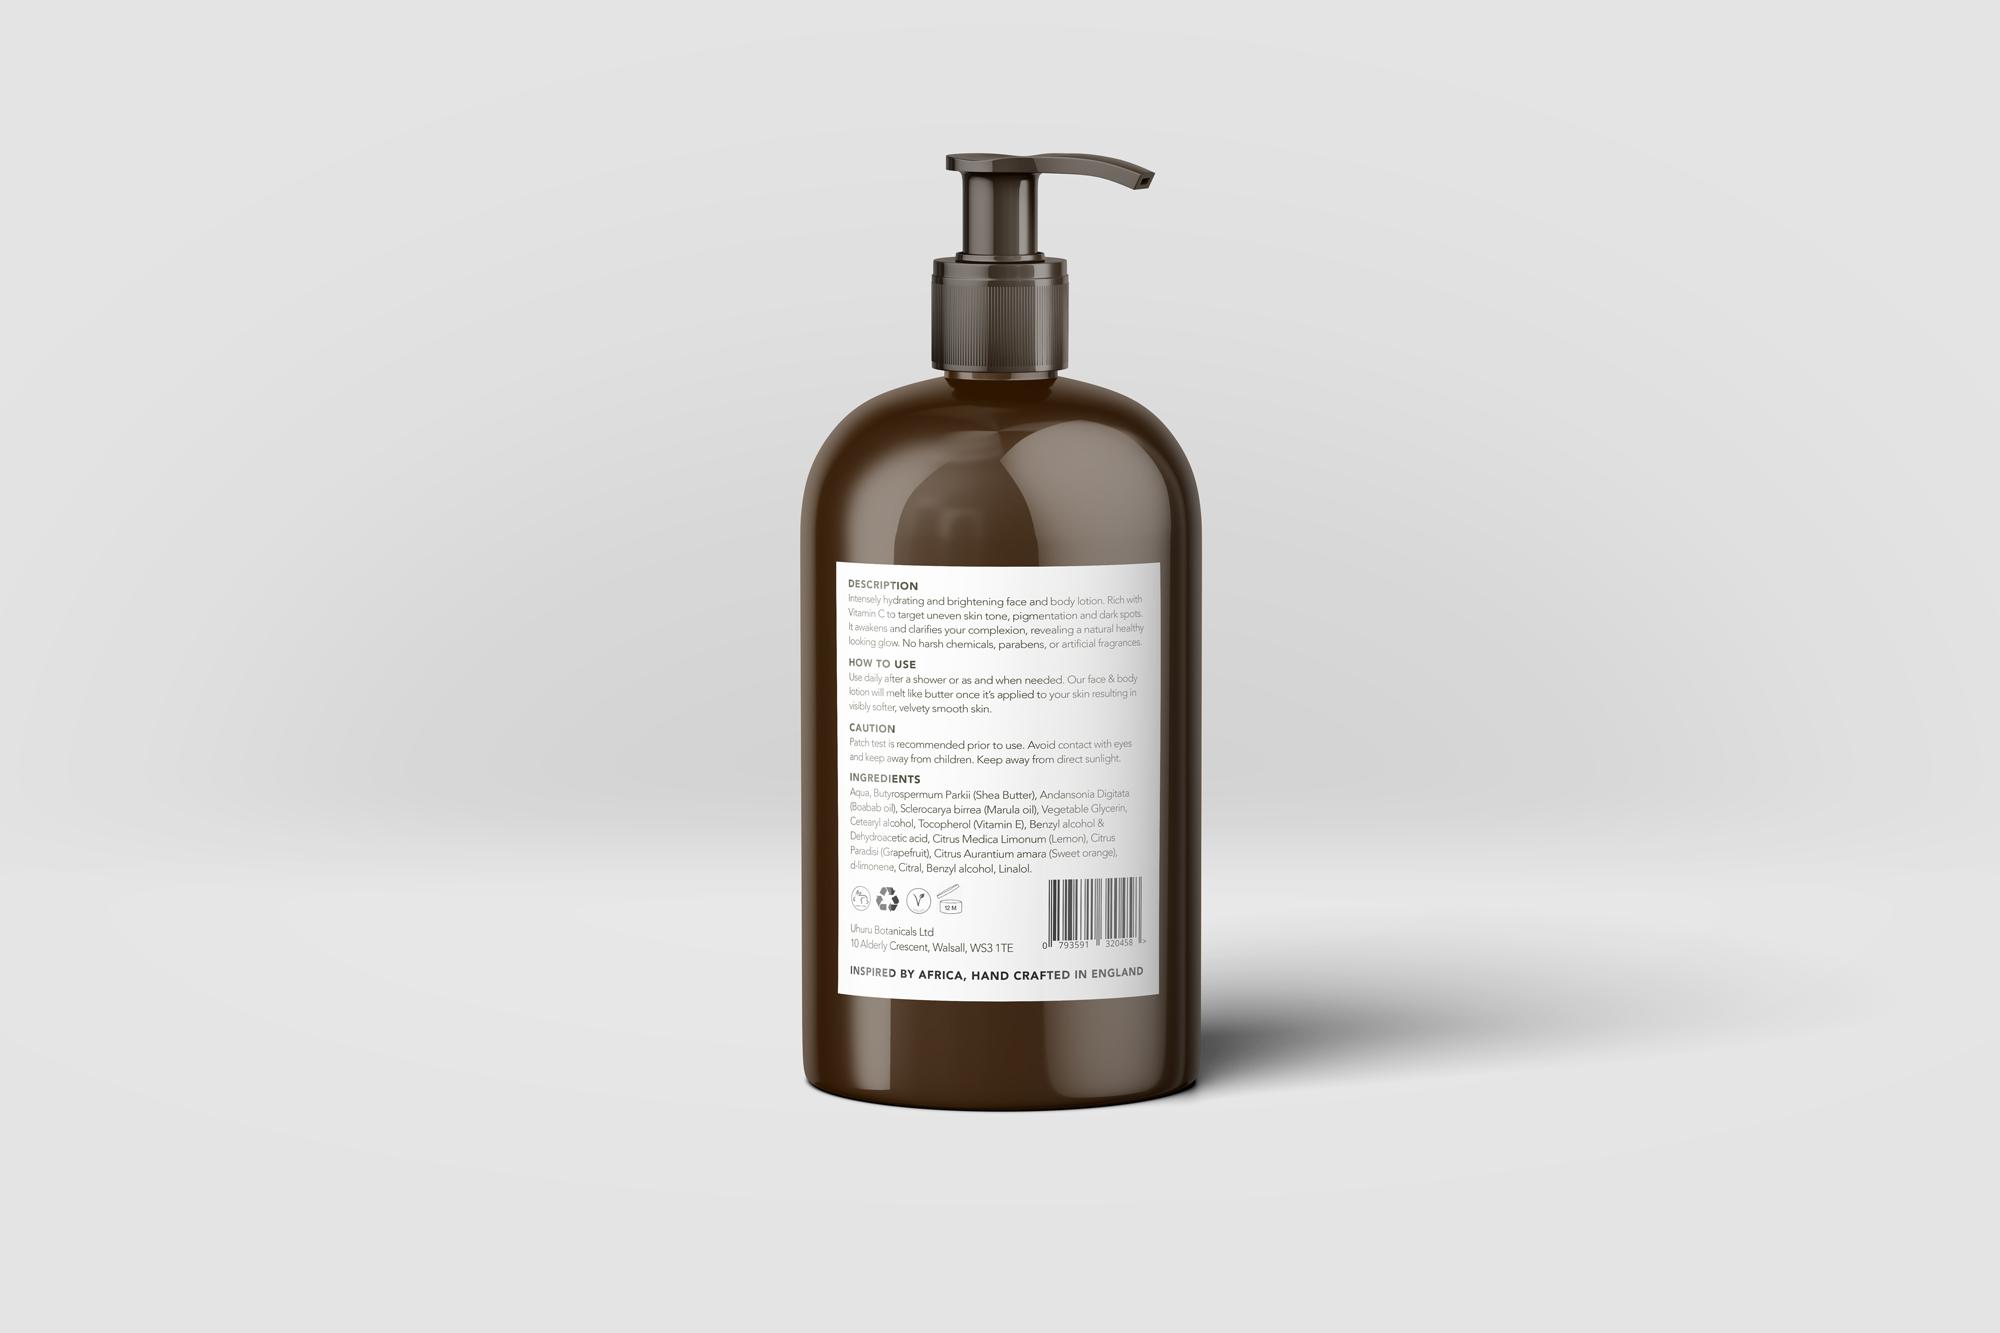 uhuru-botanicals-label-packaging-design-marula-lotion-studio-77-london-back.jpg